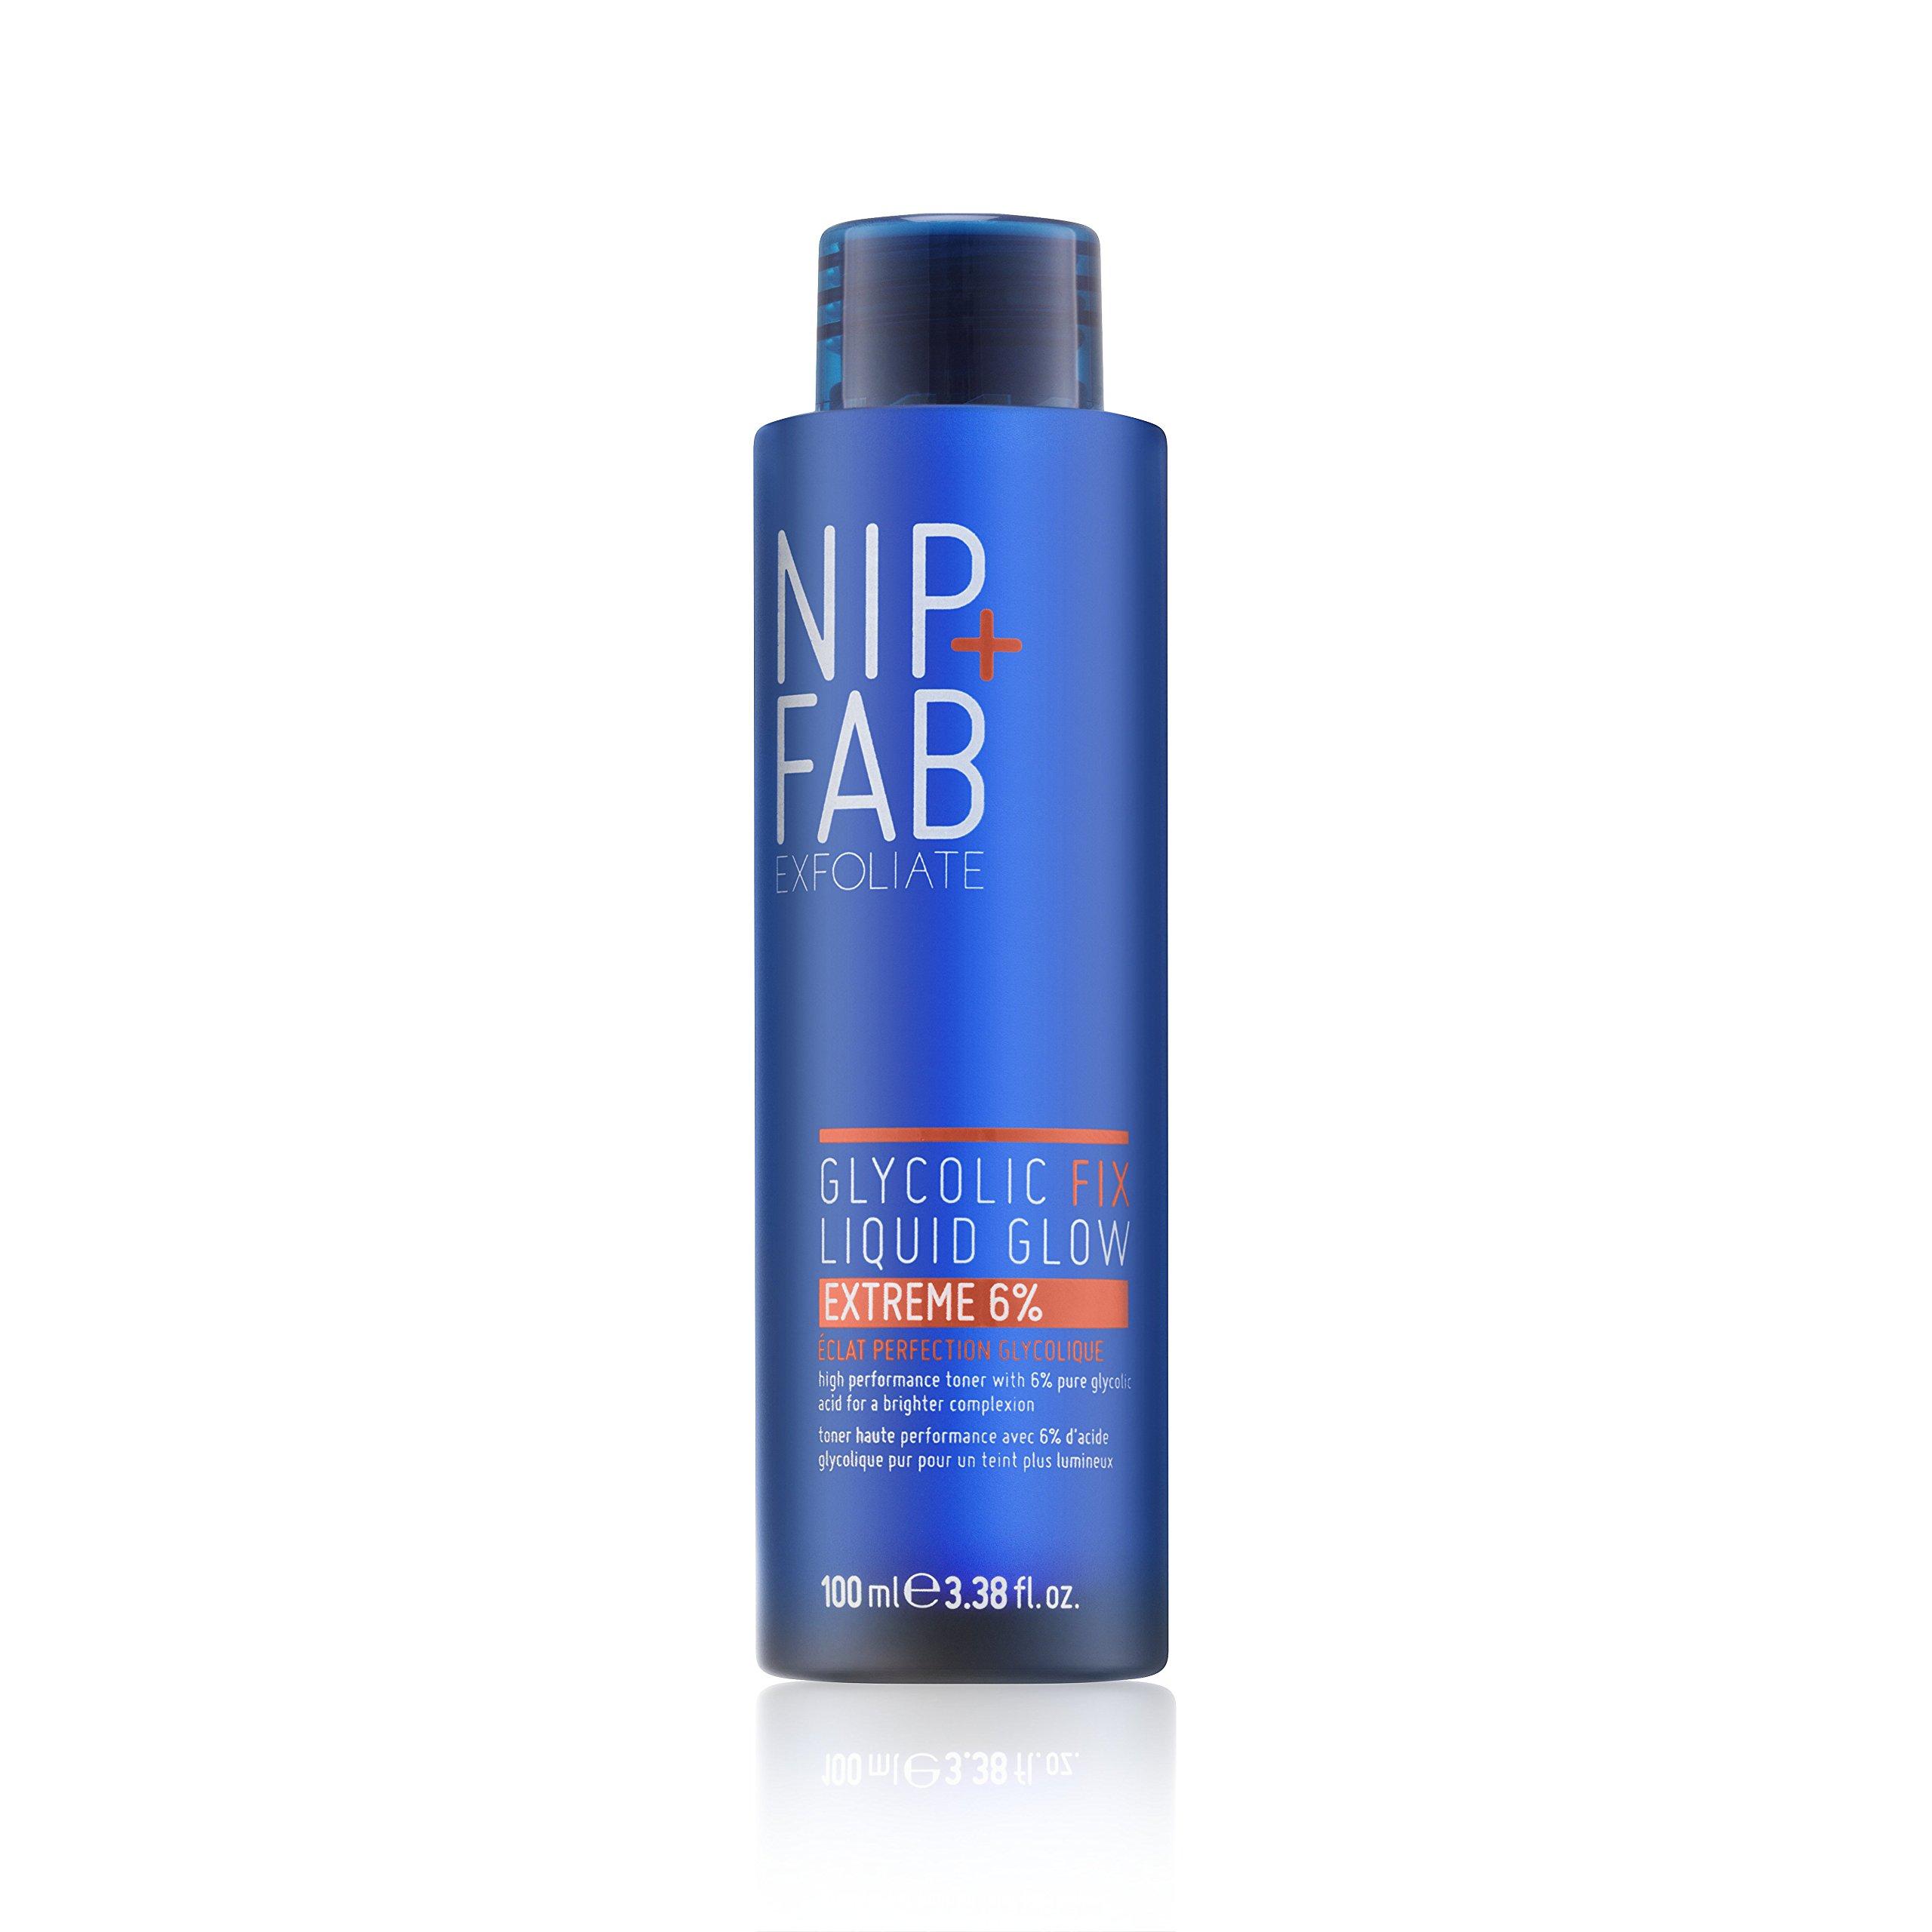 Nip+Fab Glycolic Fix Liquid Glow Extreme